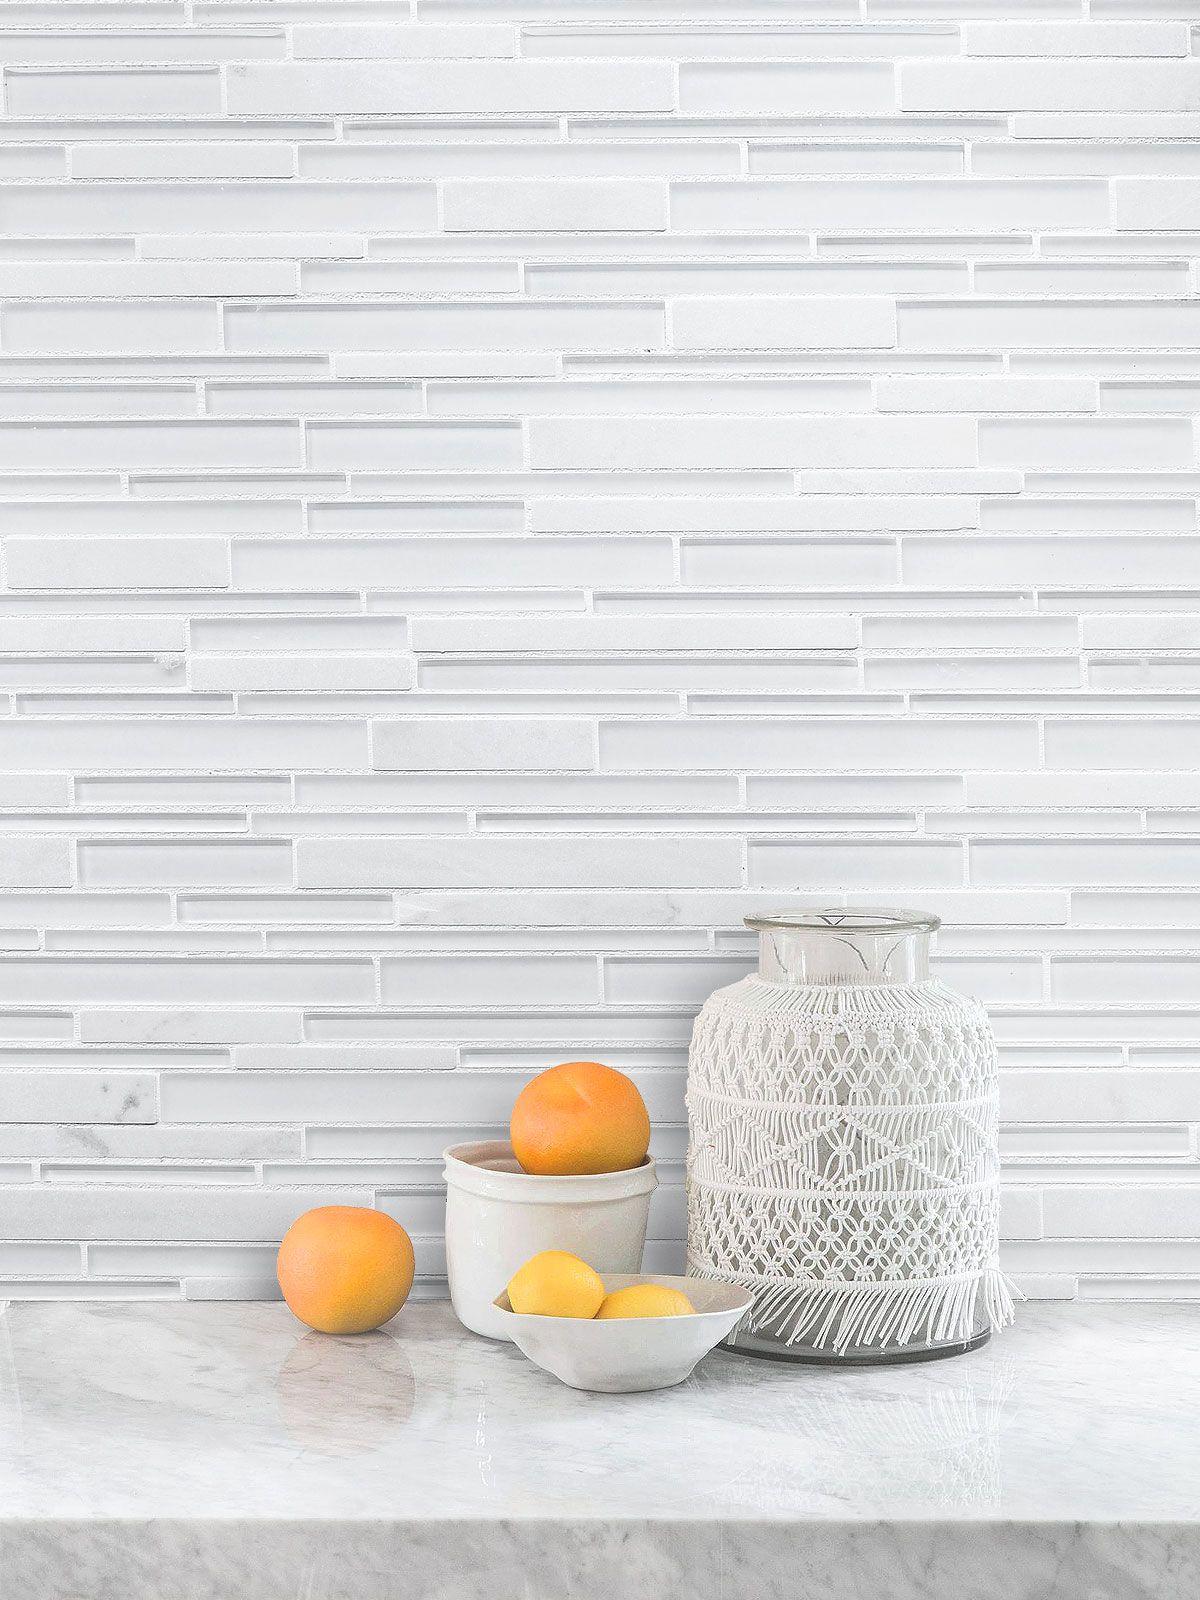 White Glass Marble Linear Backsplash Tile Backsplash Com Glass Backsplash Glass Tile Backsplash Kitchen White Glass Tile